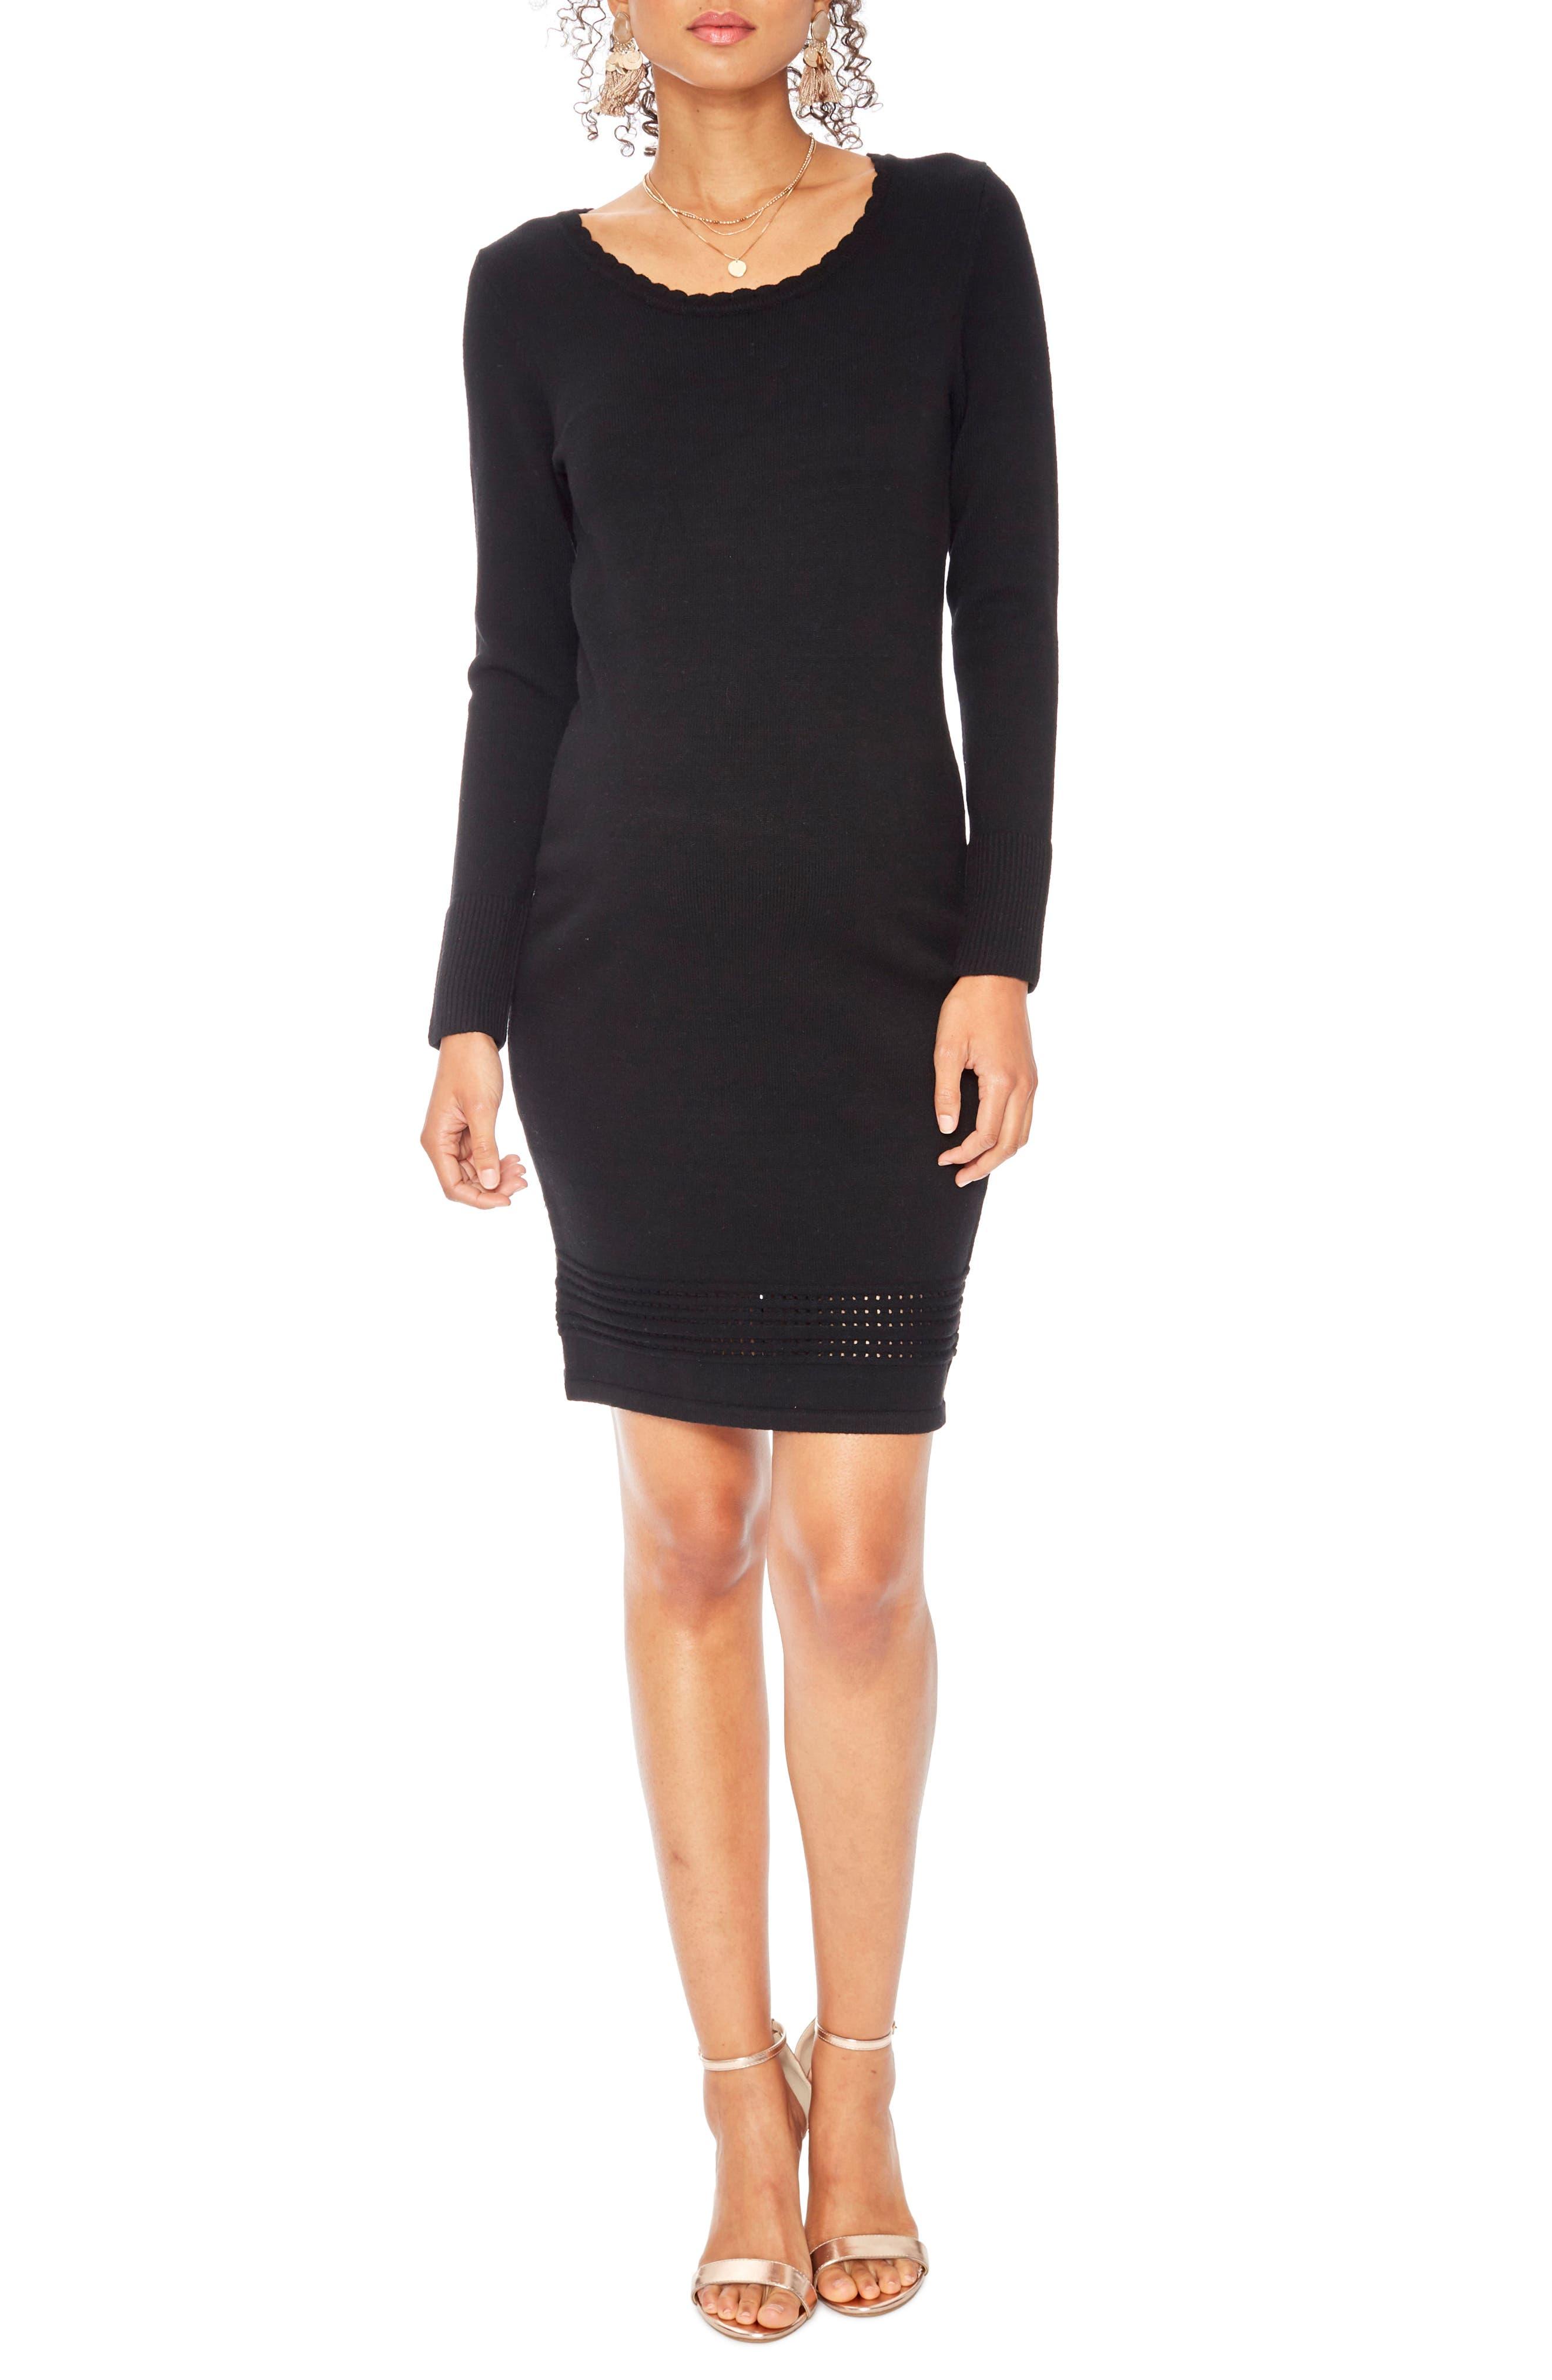 Rosie Pope Savannah Maternity Dress, Black